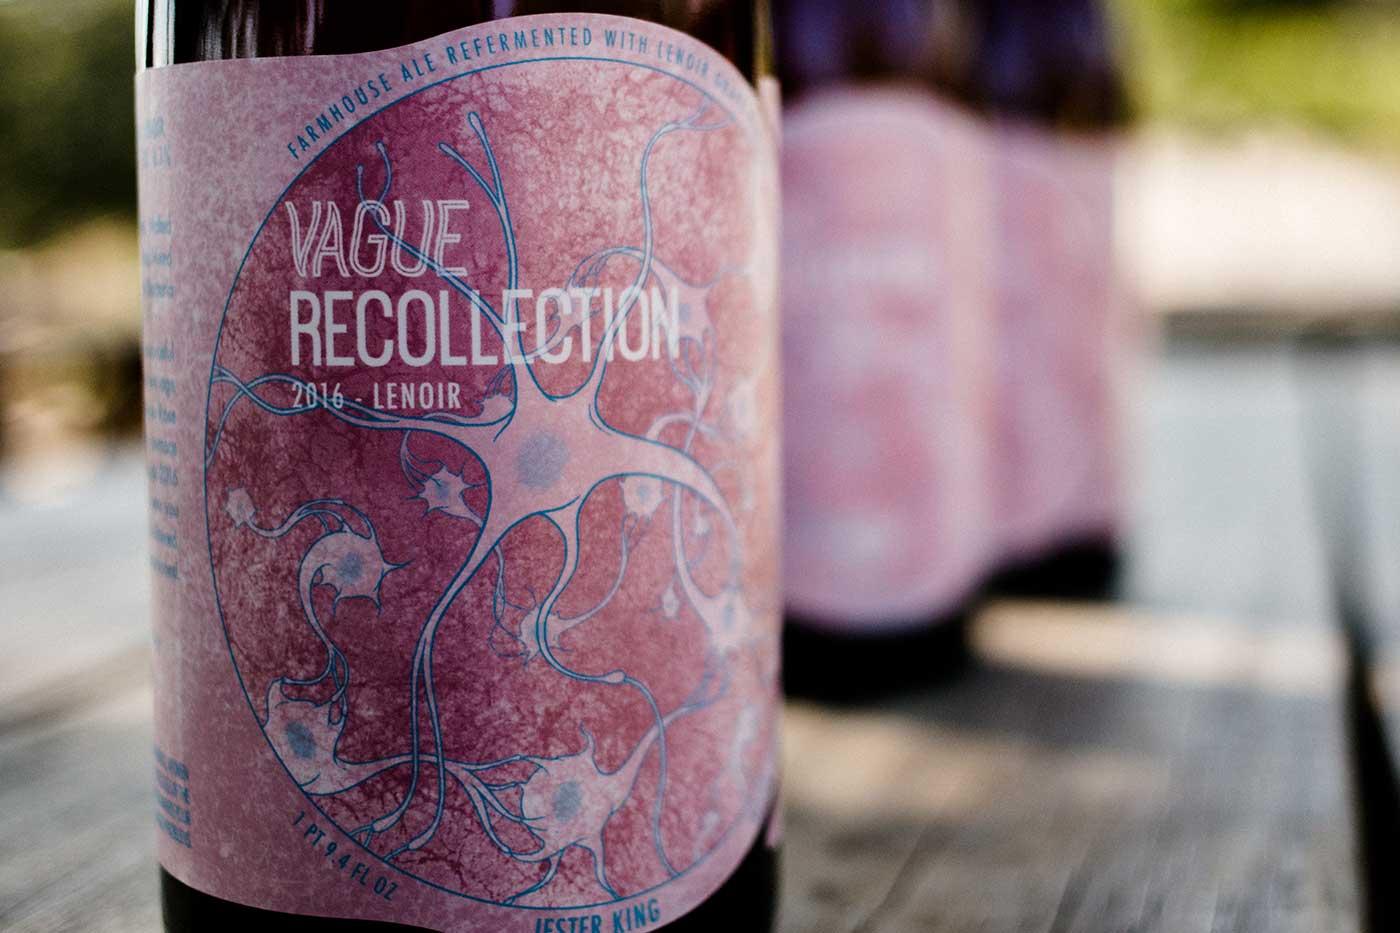 vaguerecollection.jpg